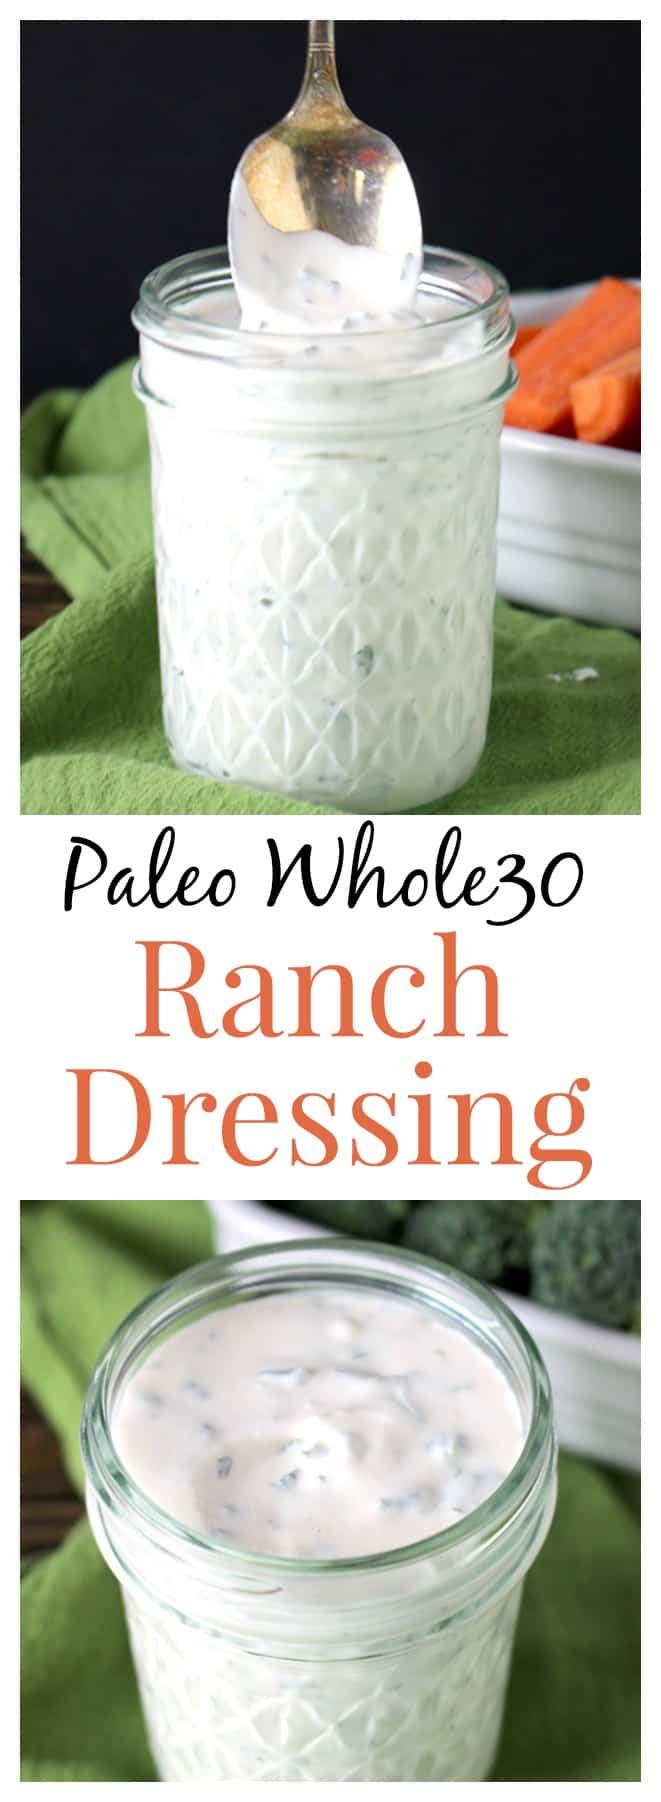 Paleo Whole30 Ranch